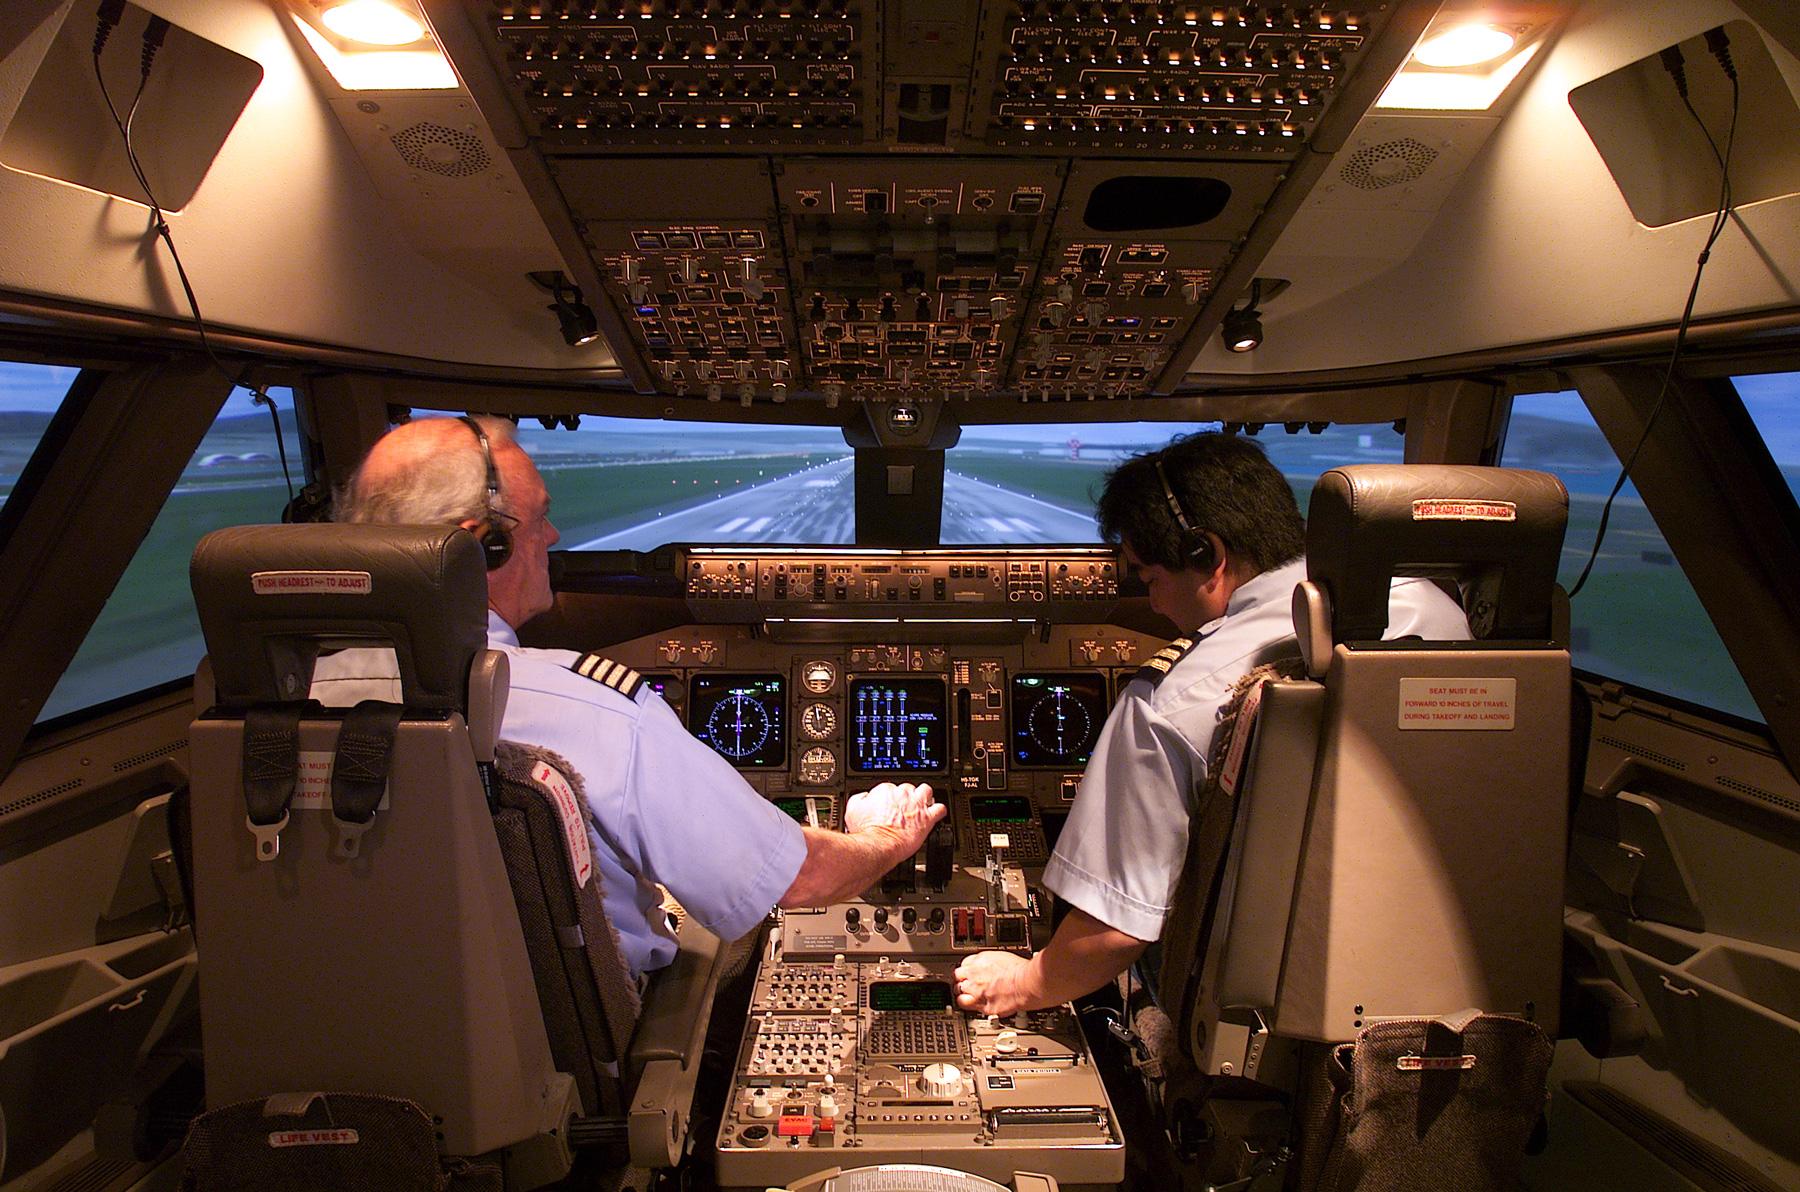 Ames Aeronautics Contributions to the Virgin Orbit Flight into Space - NASA